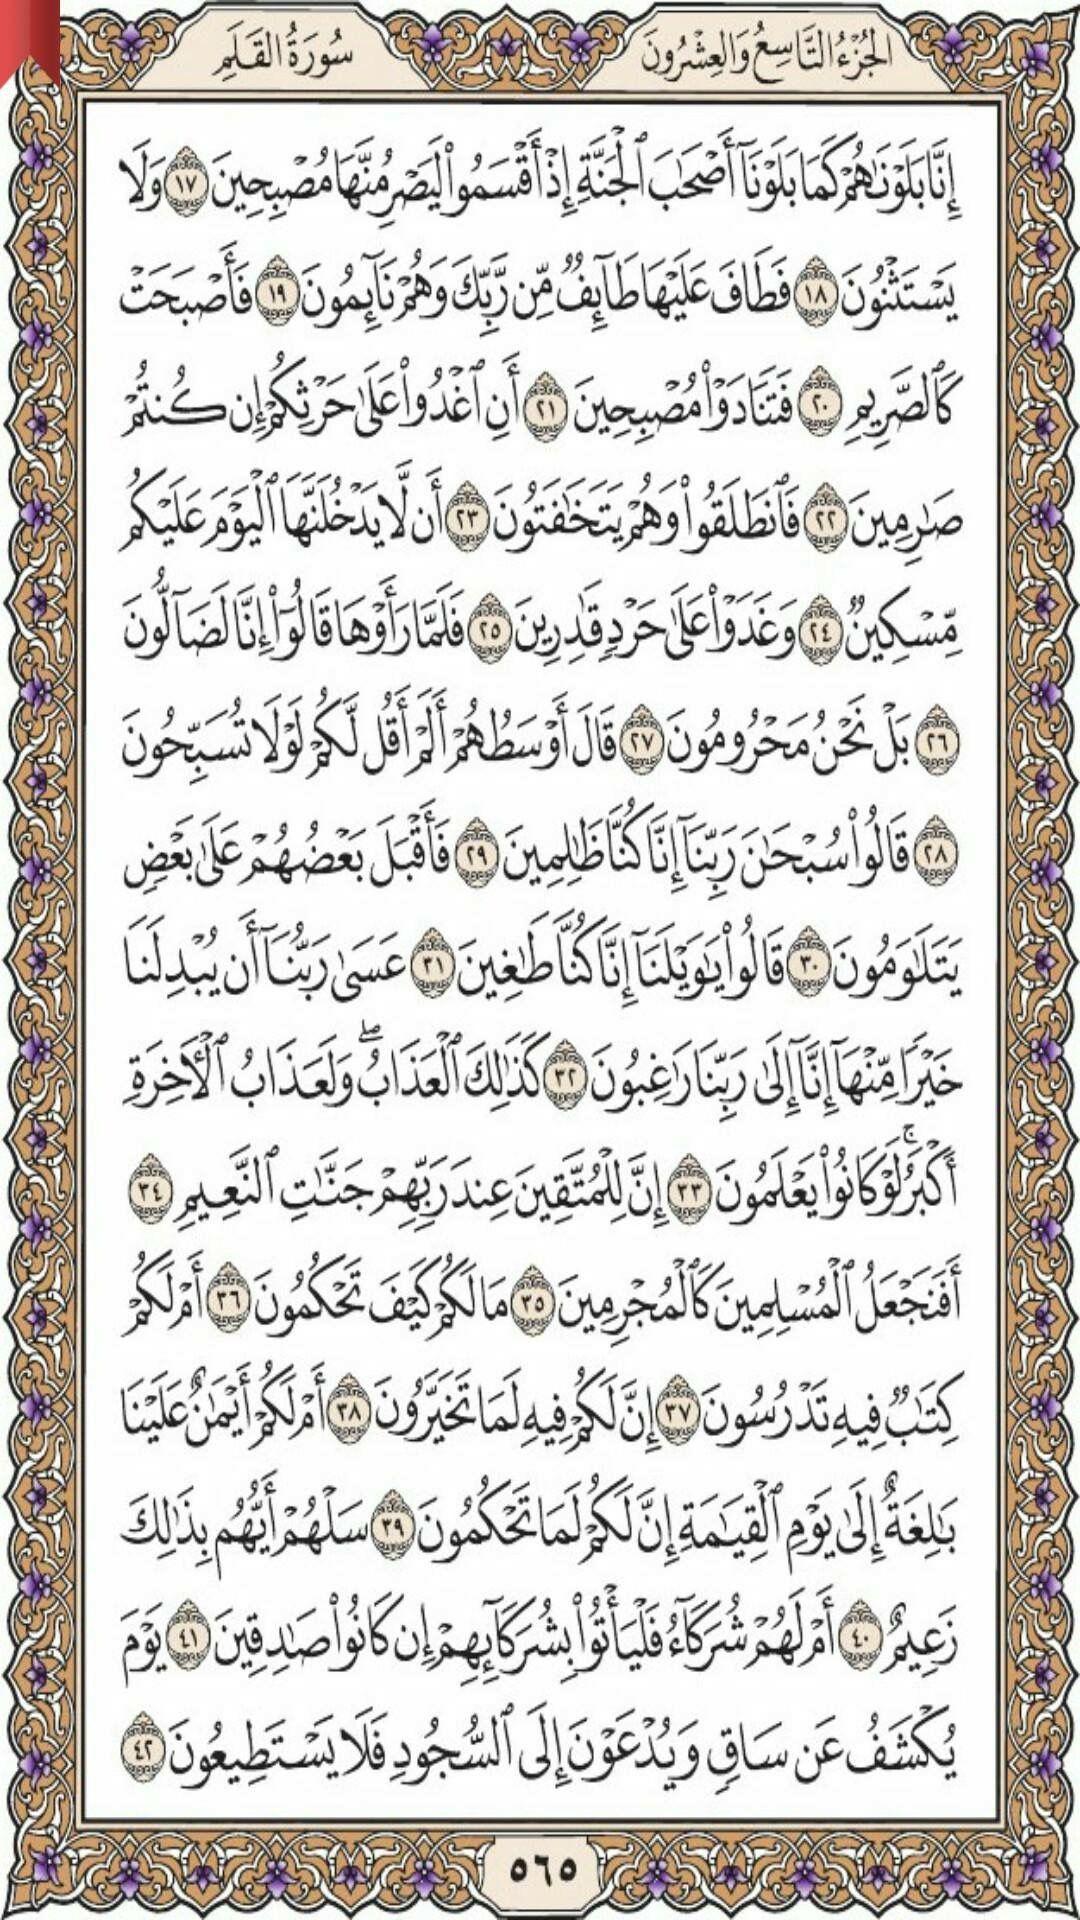 ١٧ ٤٢ القلم Quran Holy Quran Book Quran Book